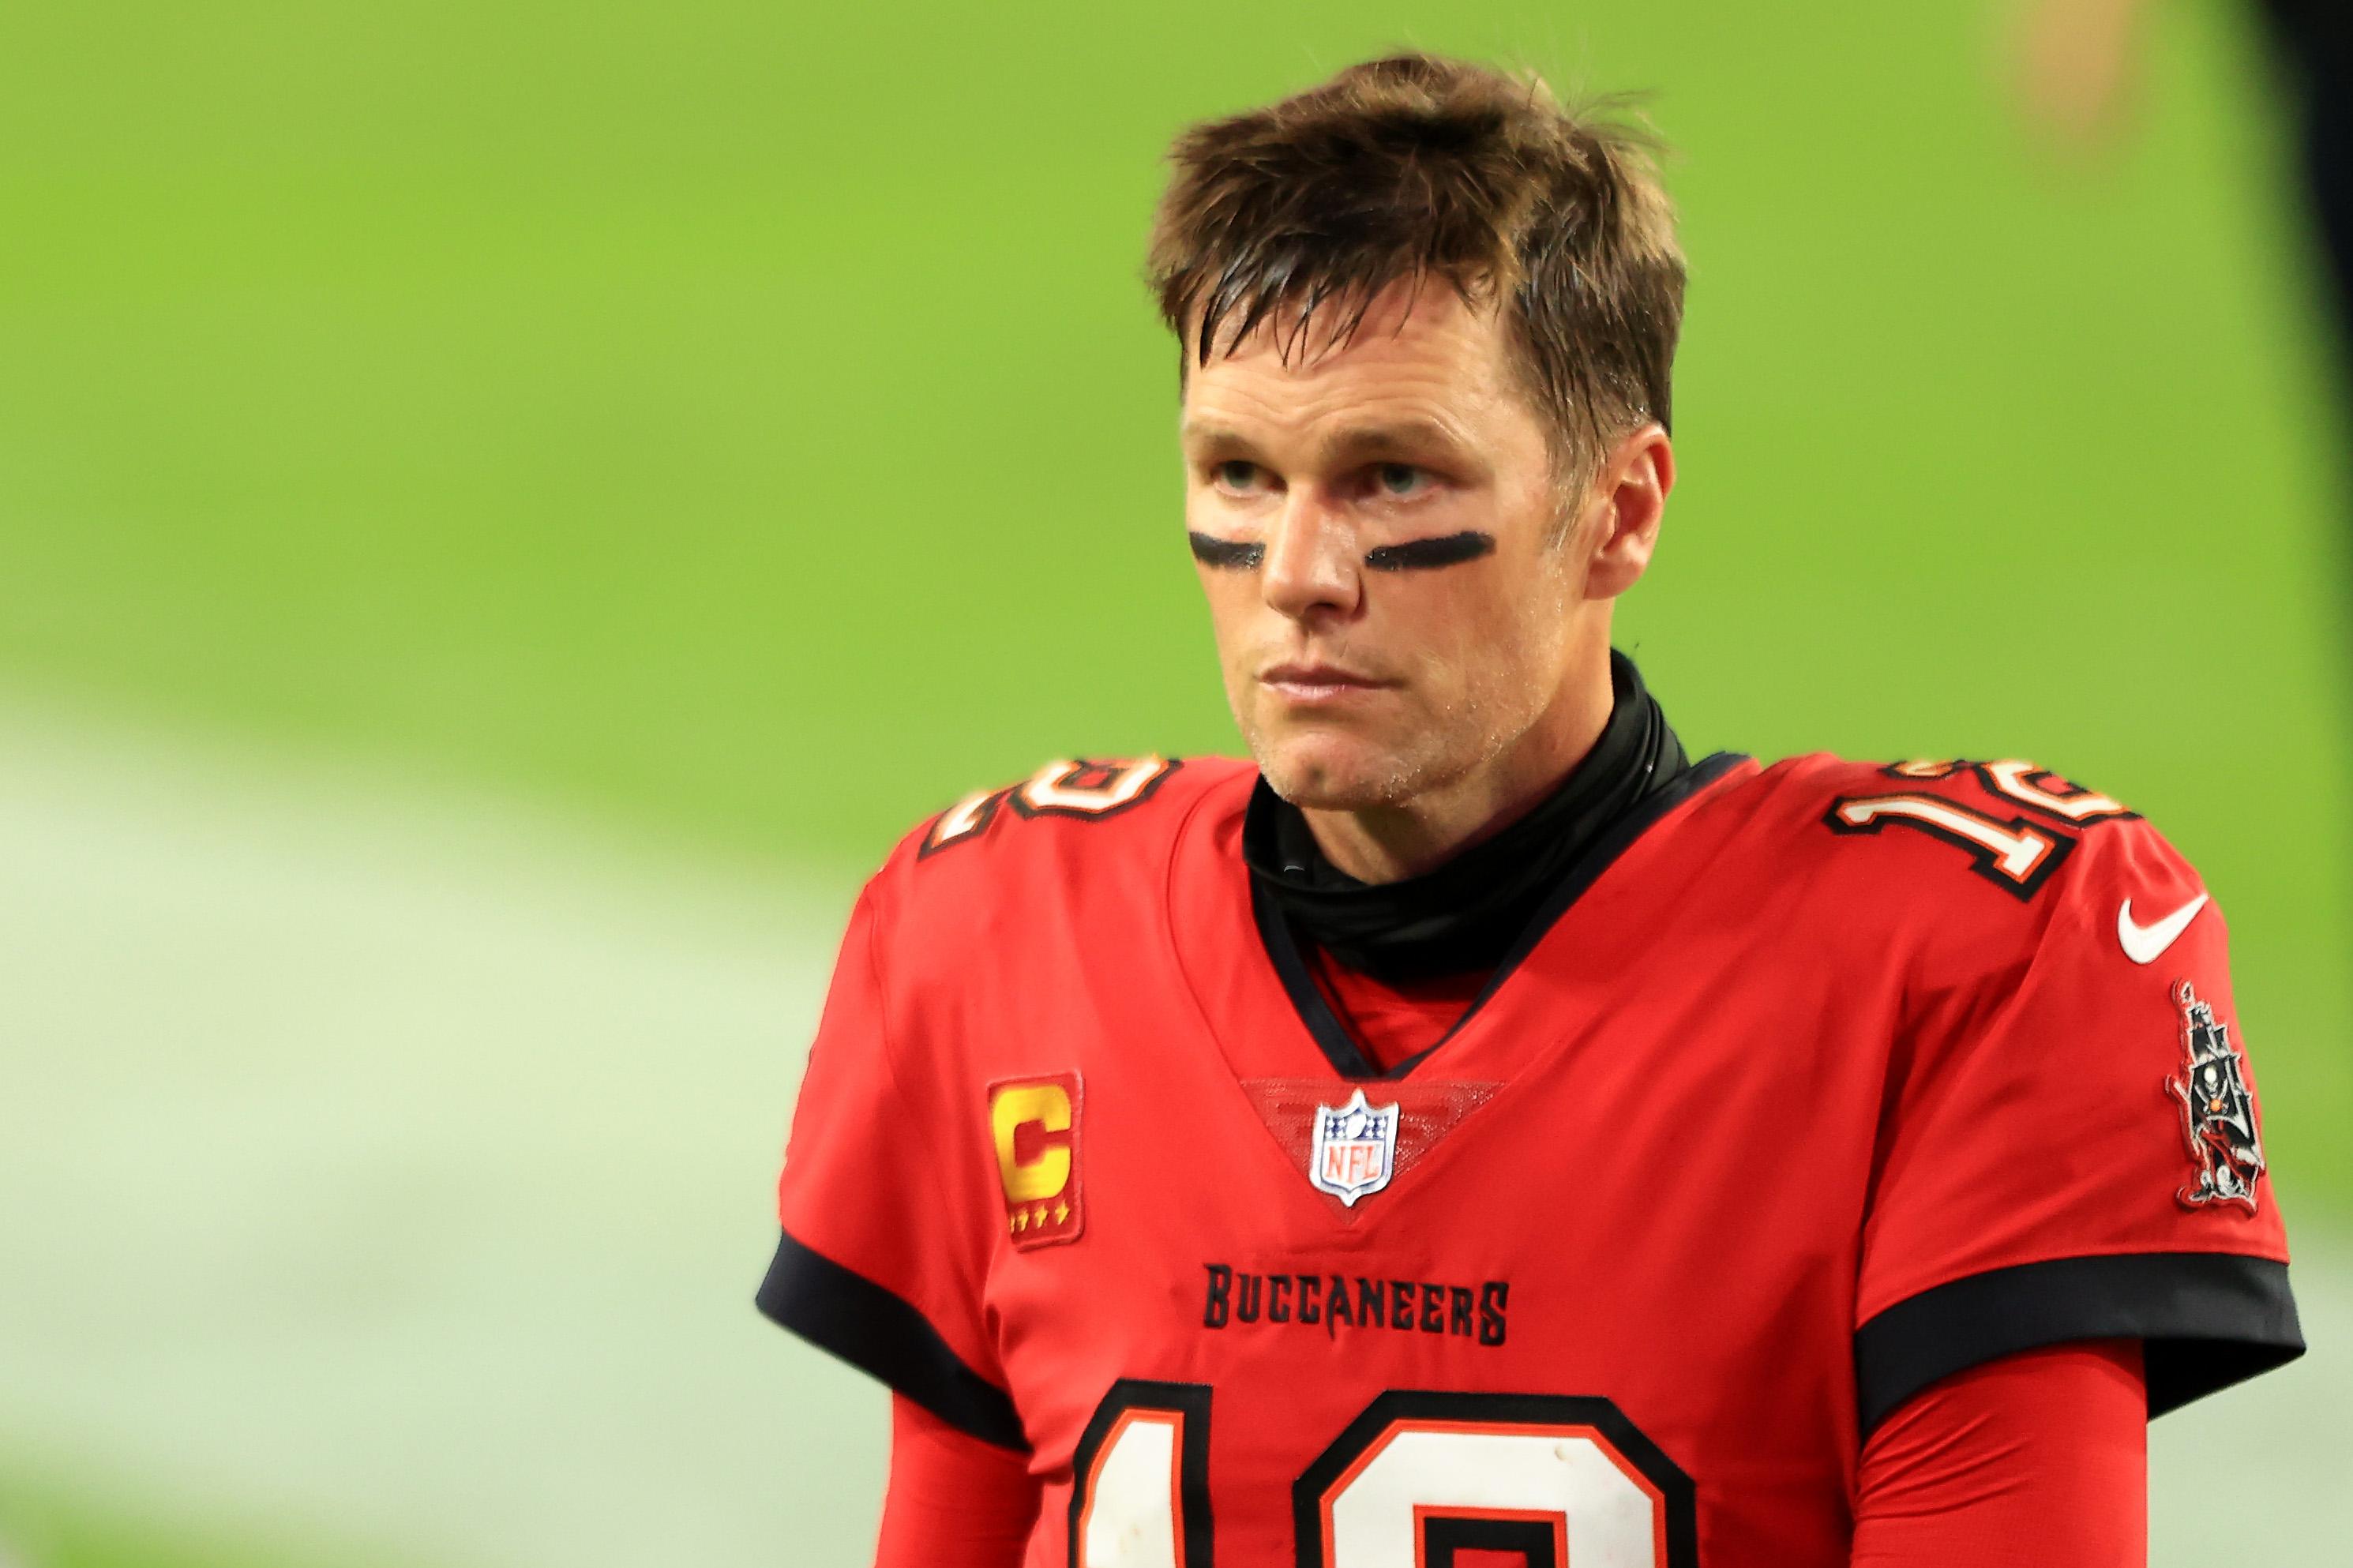 The Bucs QB Tom Brady